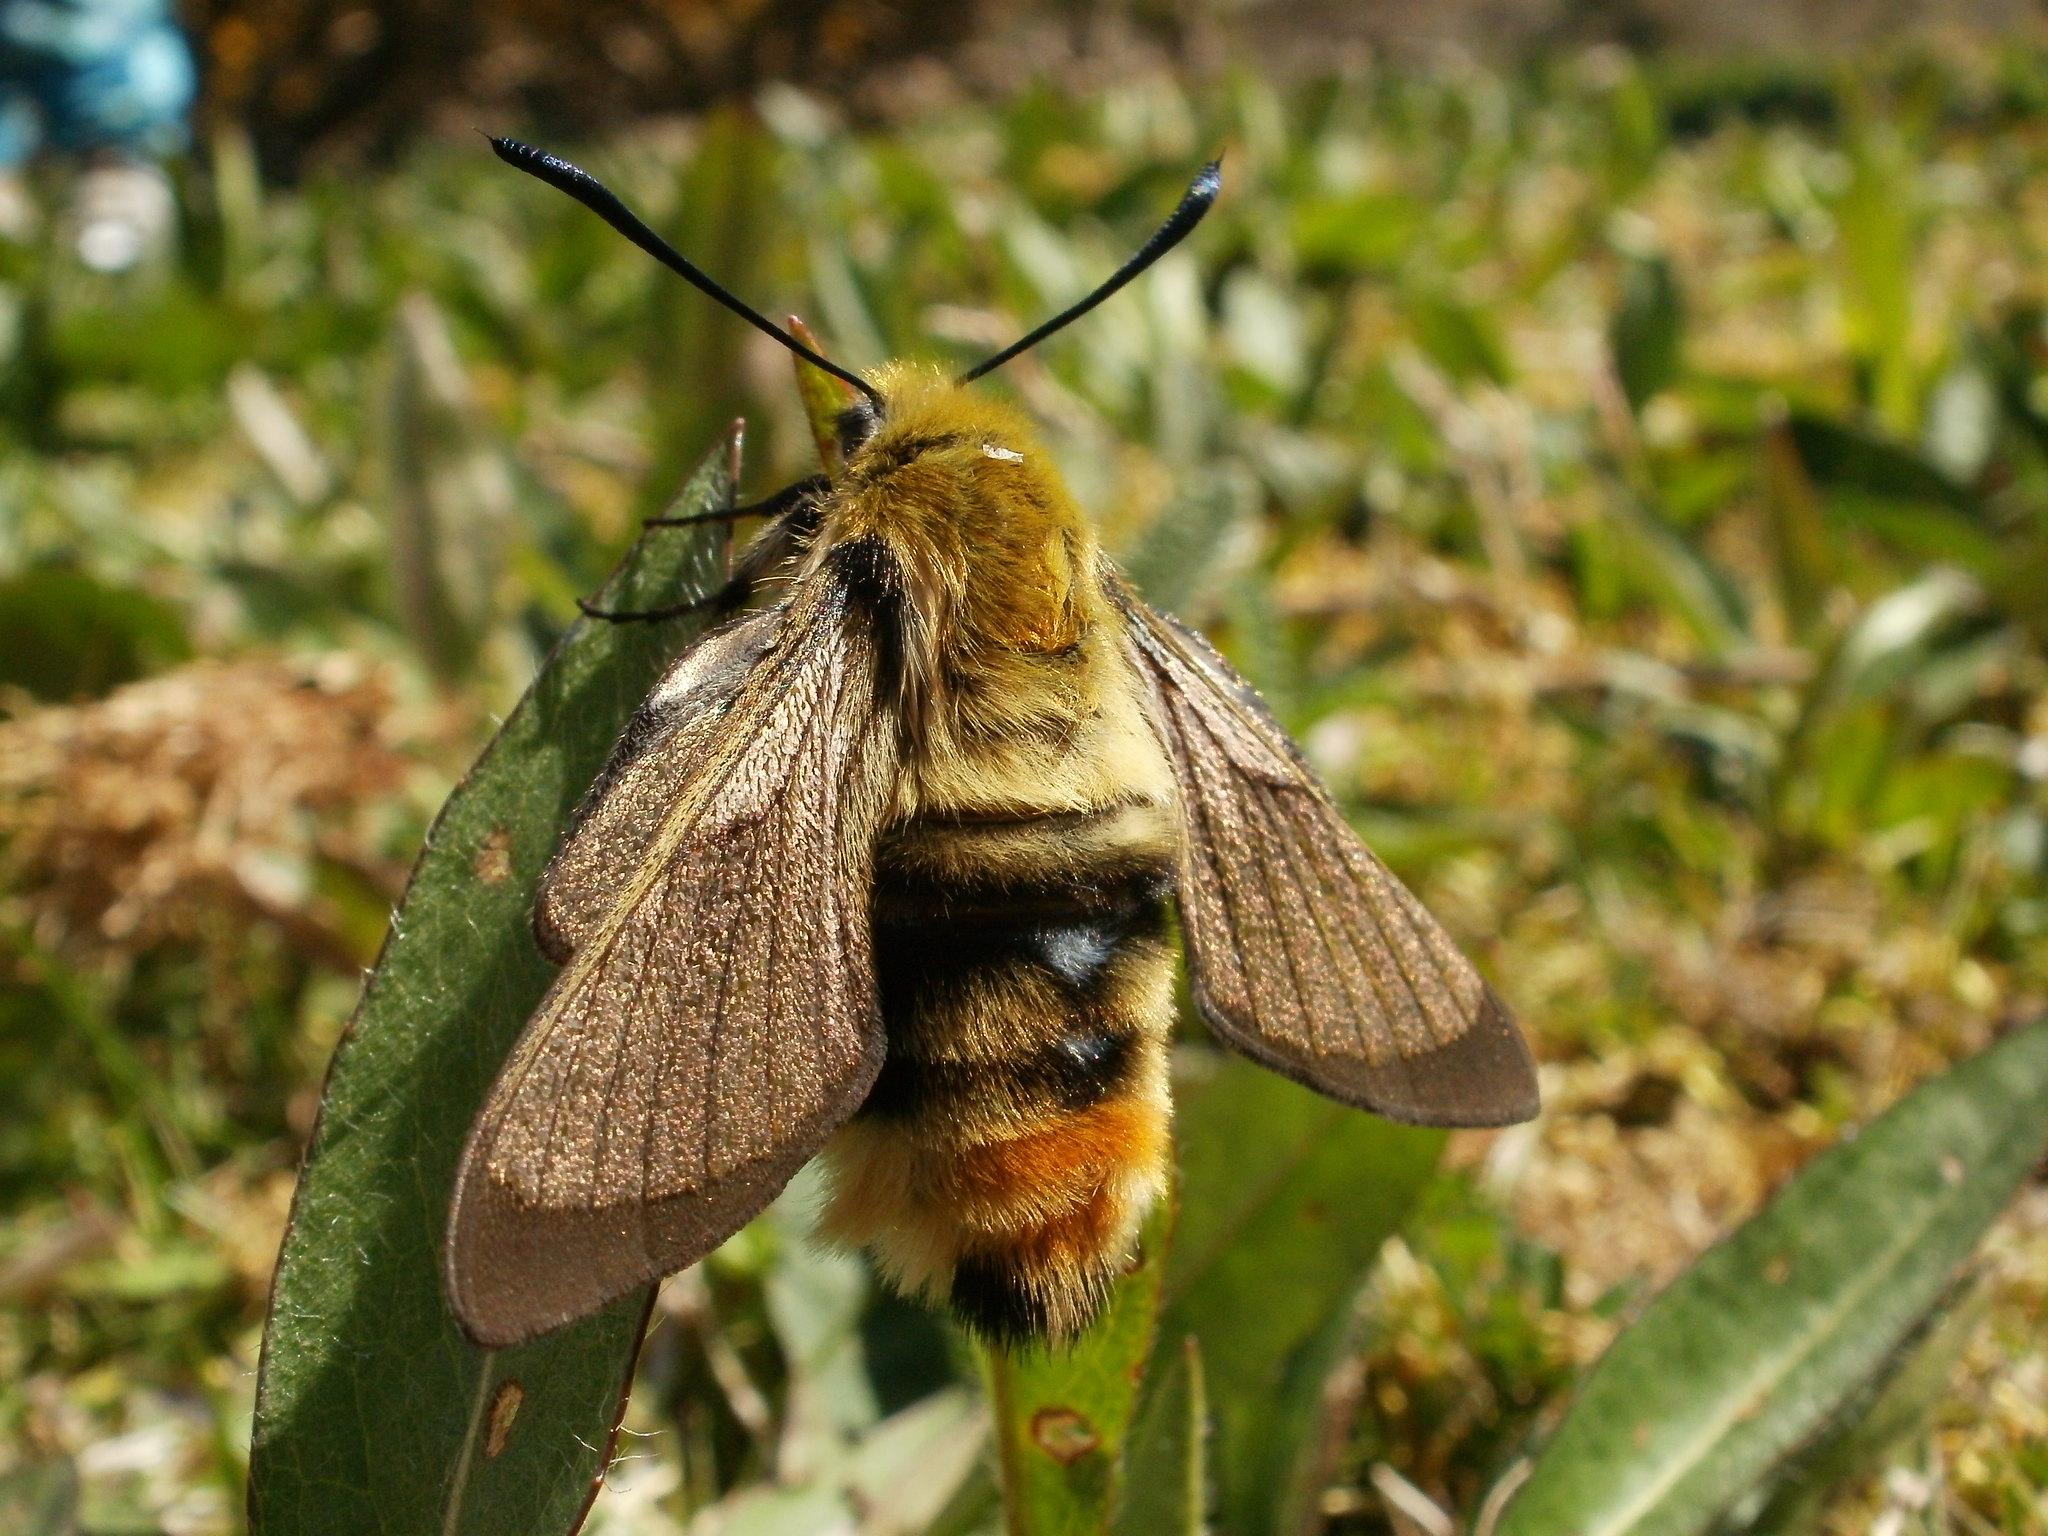 Narrow-bordered Bee Hawkmoth